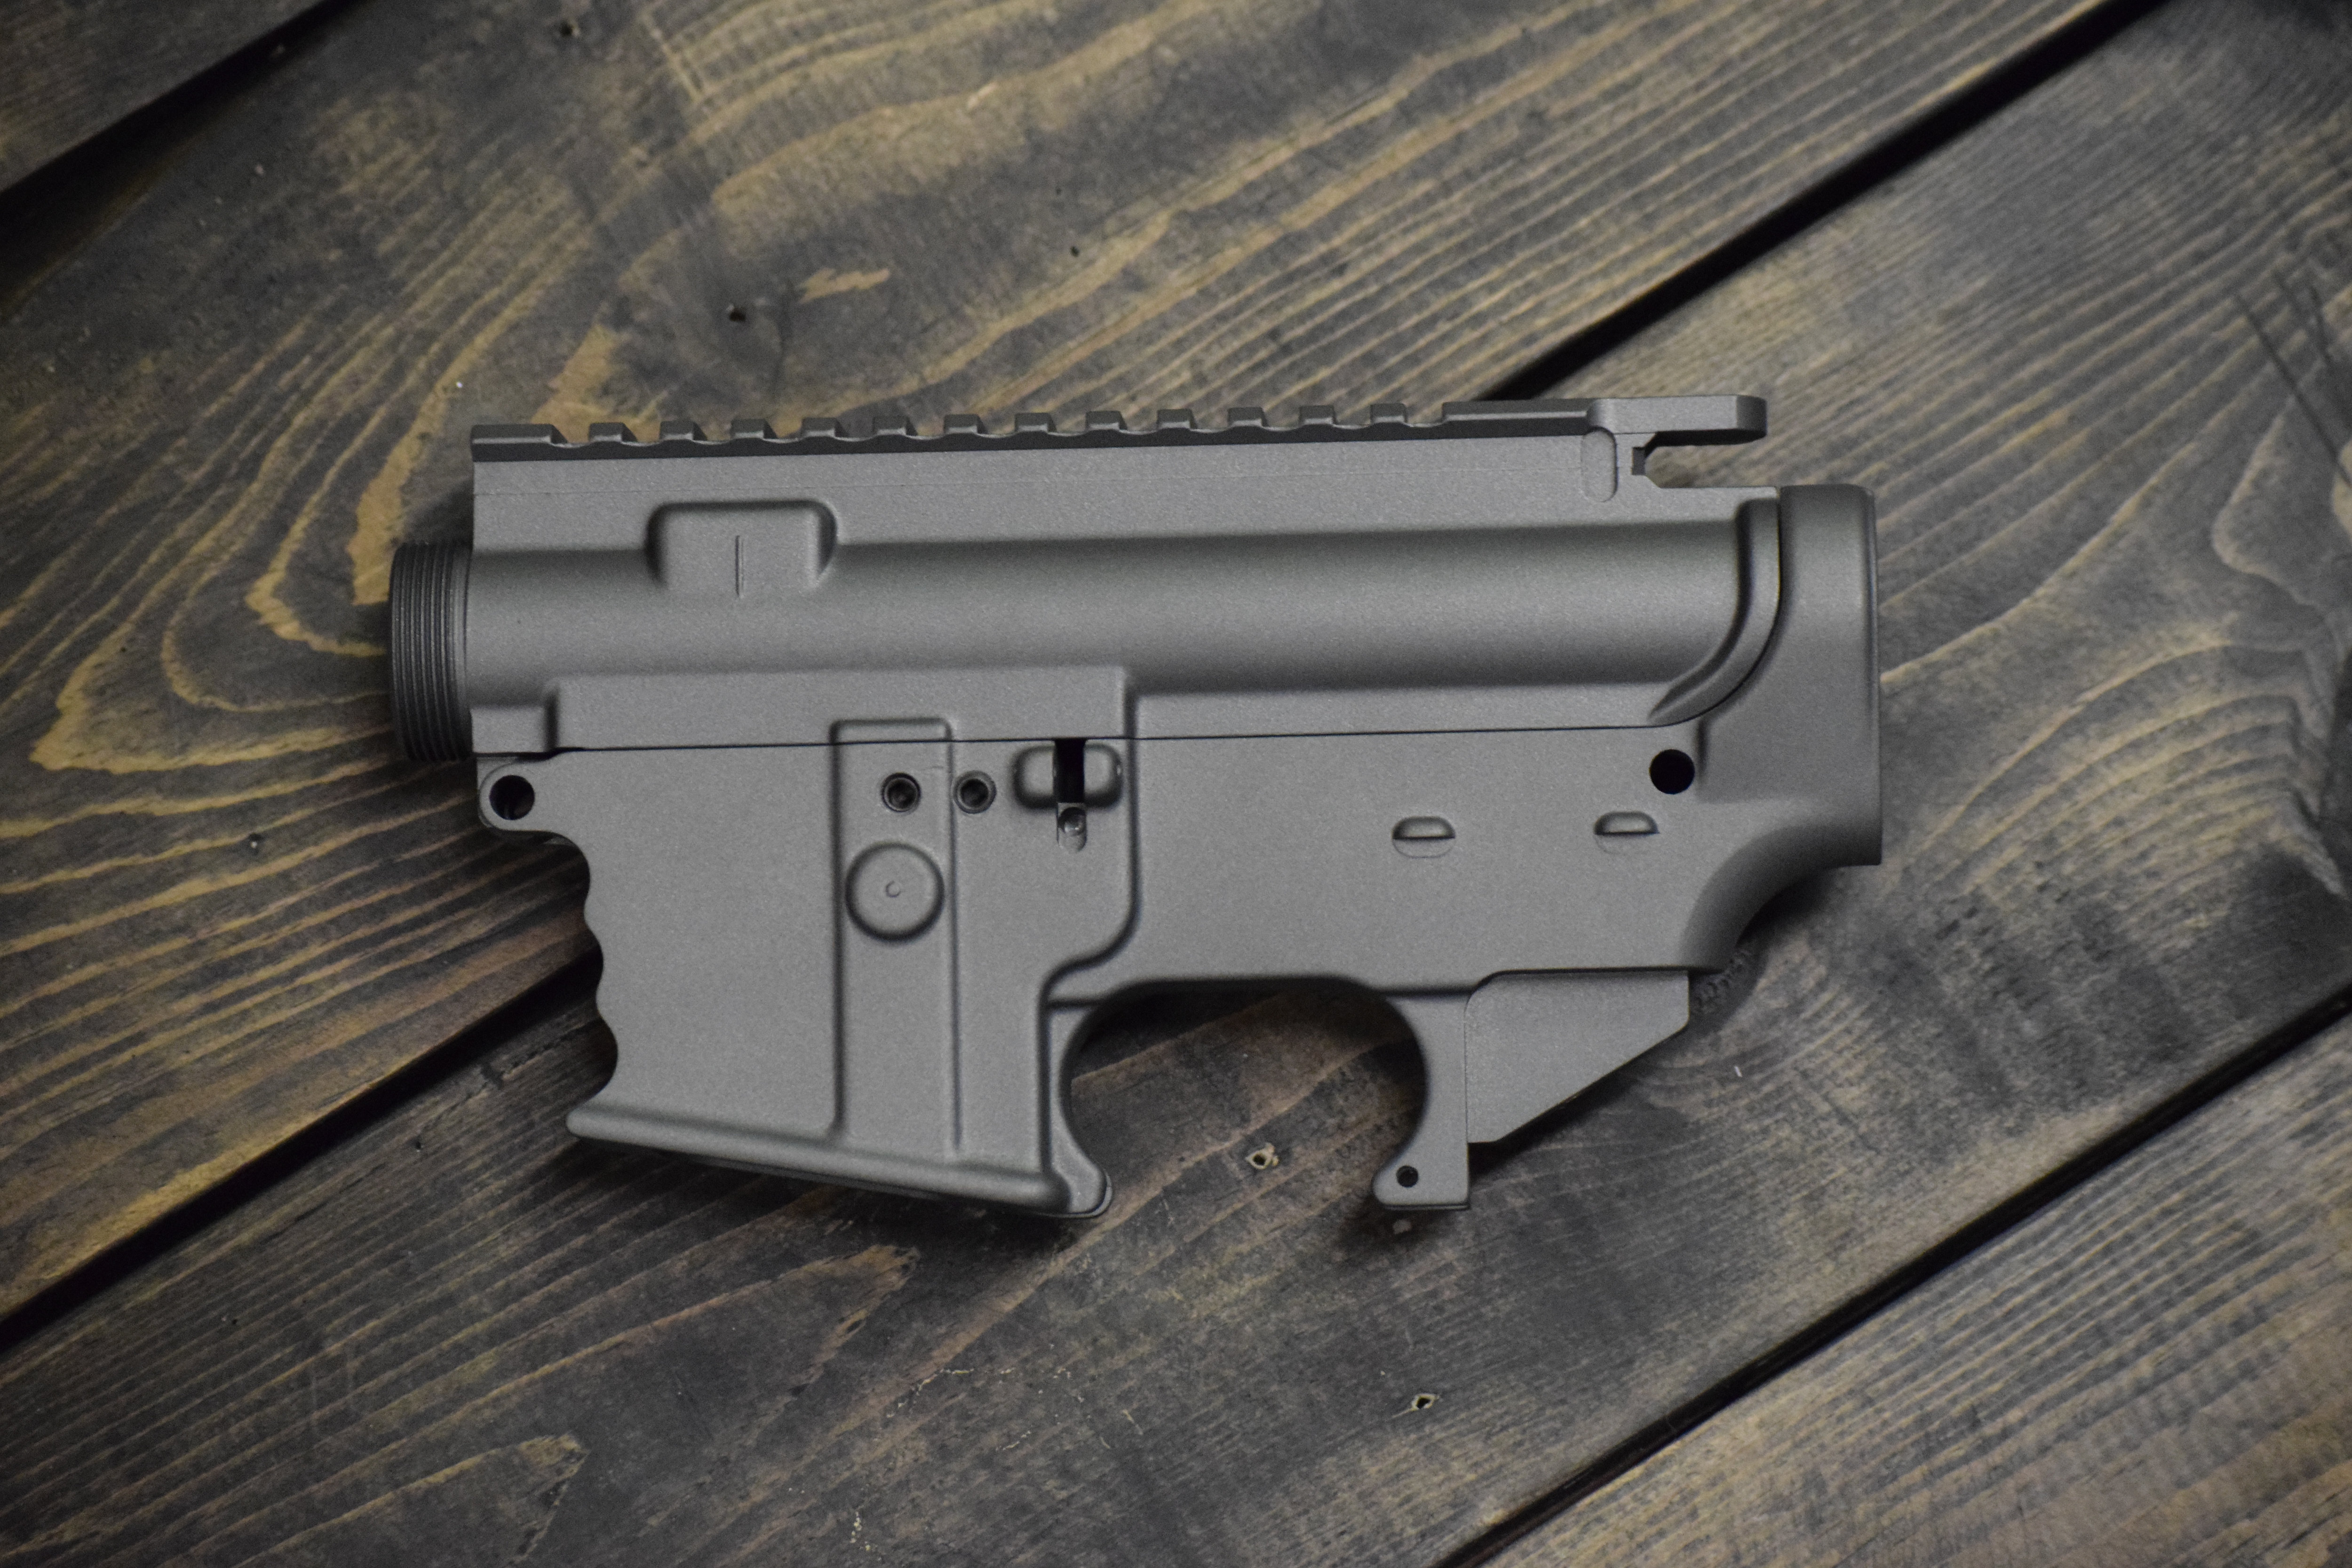 Cerakoted AR9 Upper/80% Lower Set (LRBHO Lower)